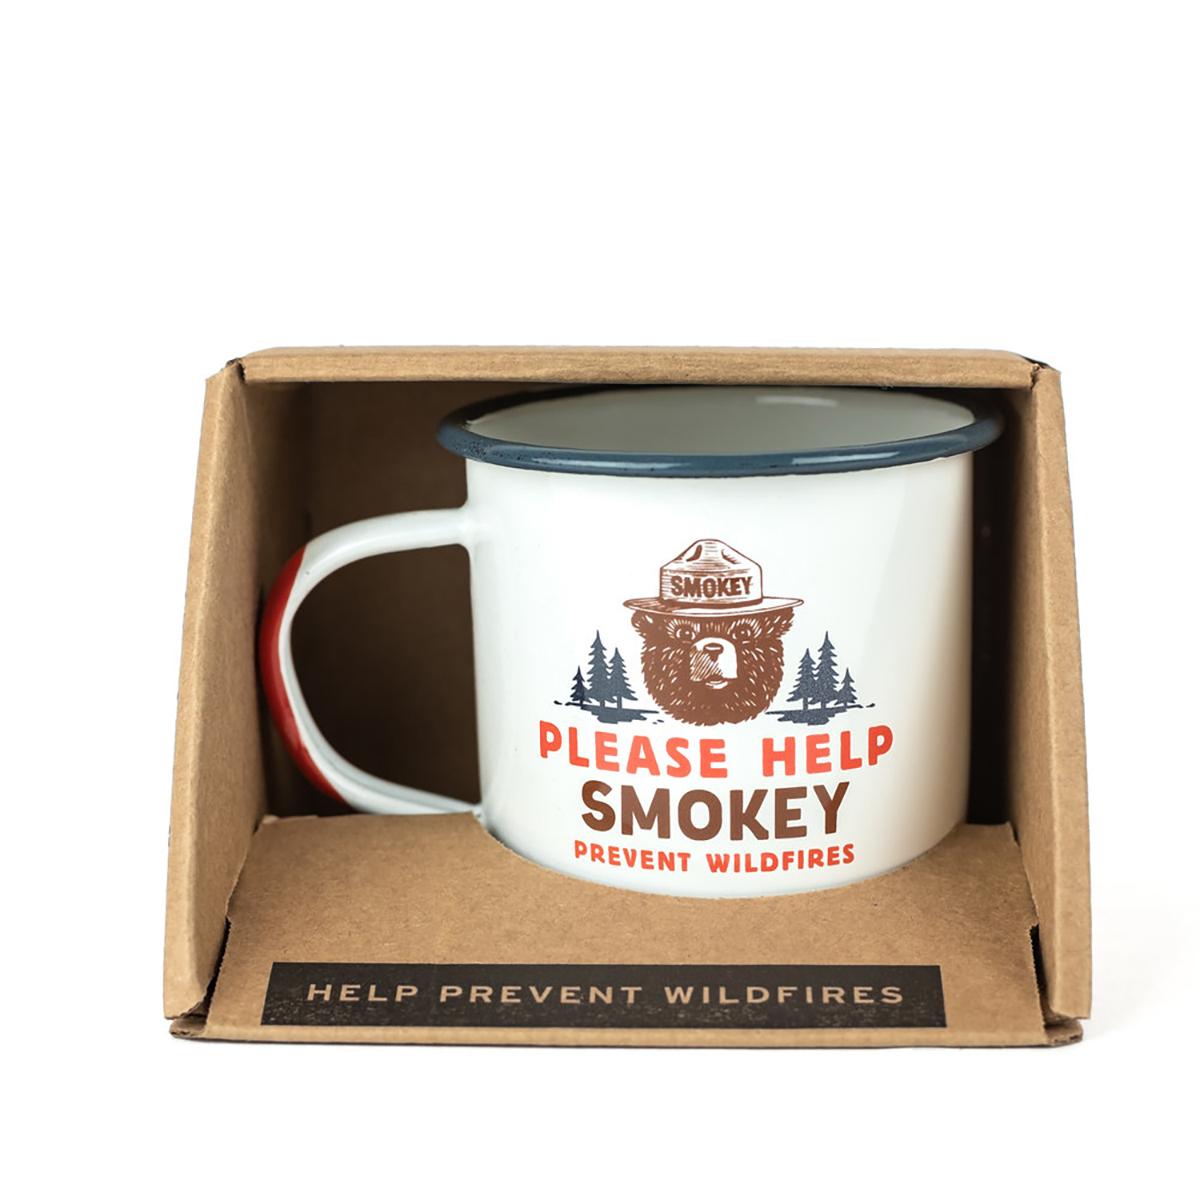 product photo of smokey bear enamel mug designed by the landmark project (www.thelandmarkproject.com)